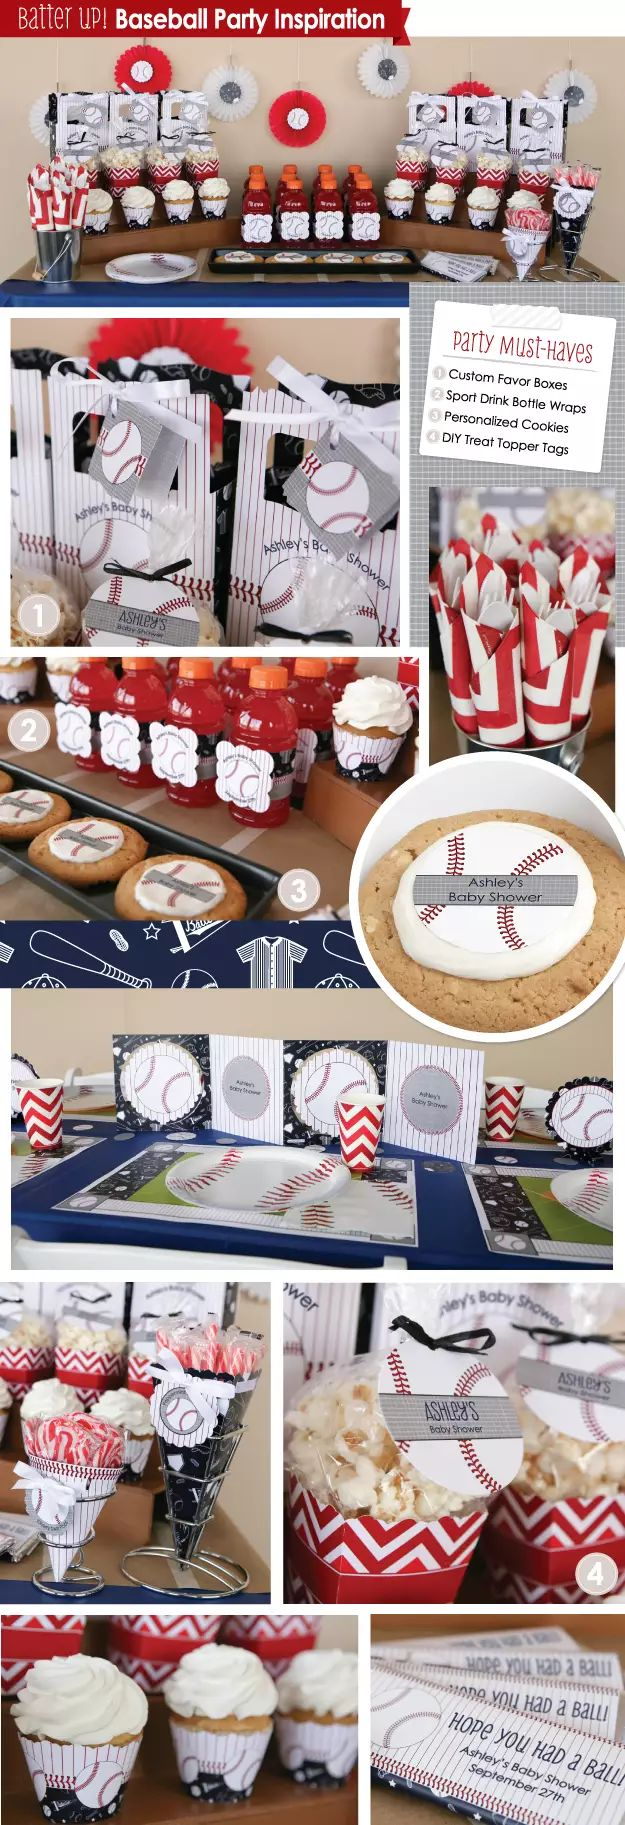 Best 25+ Baseball party supplies ideas on Pinterest | Baseball ...